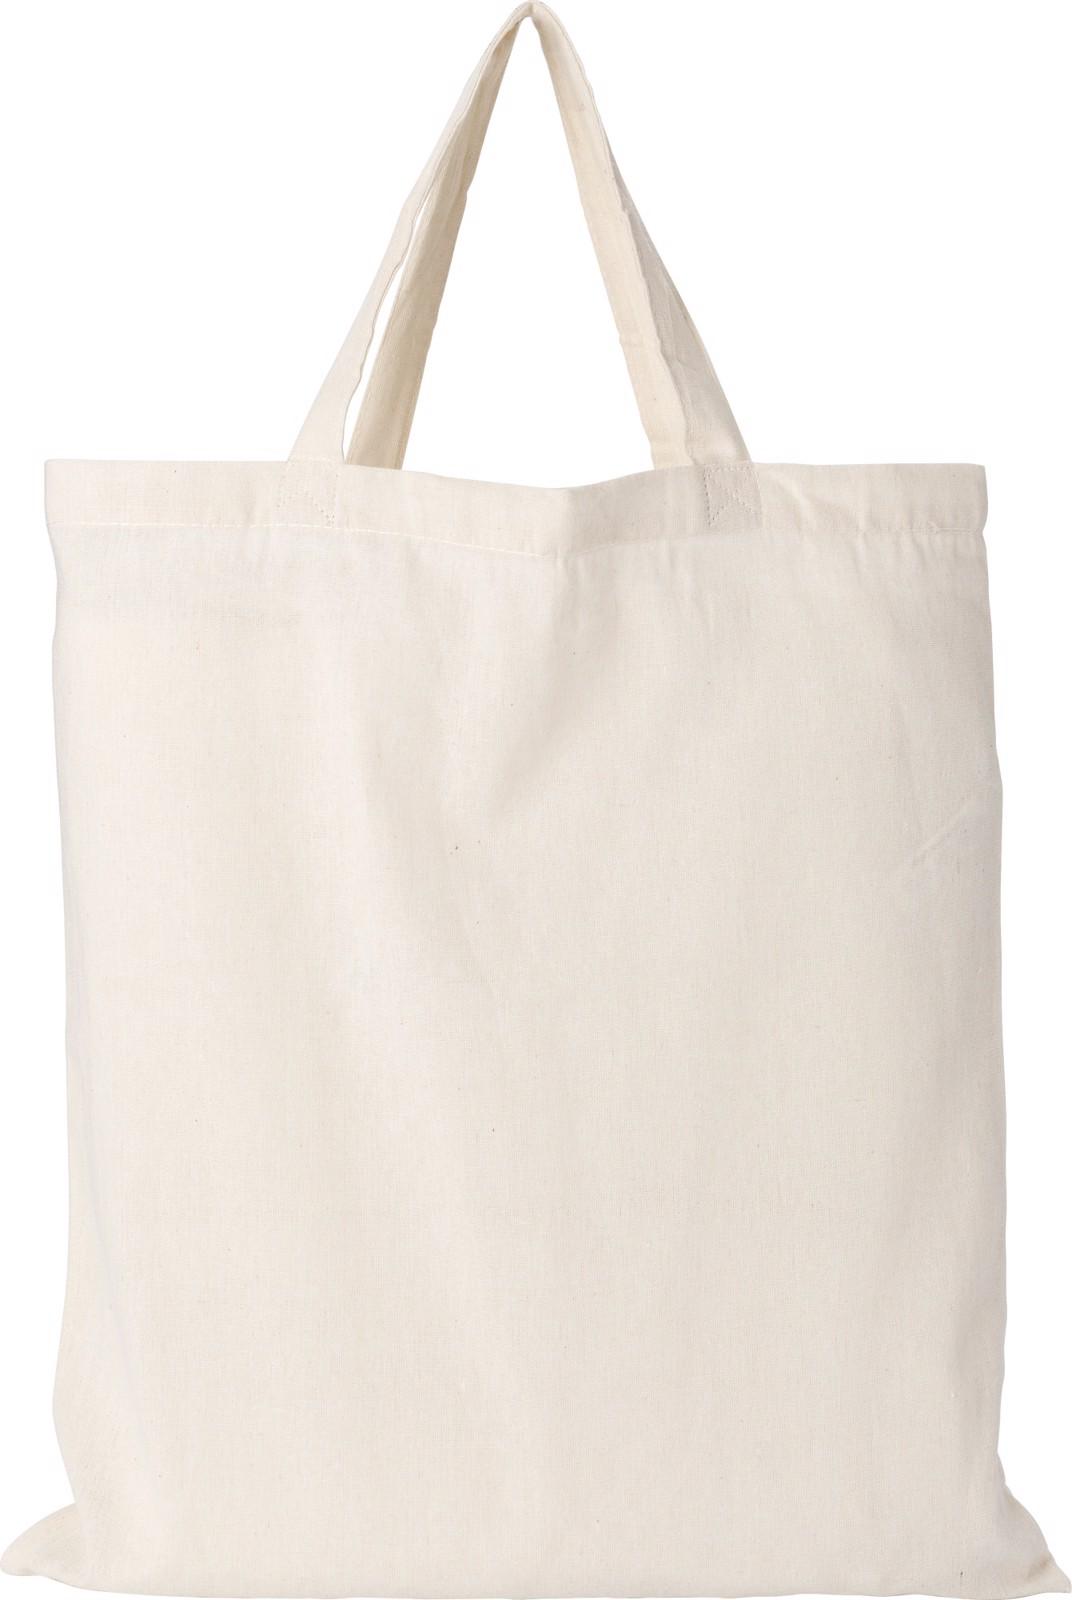 Bolsa de algodón 110 gr/m²